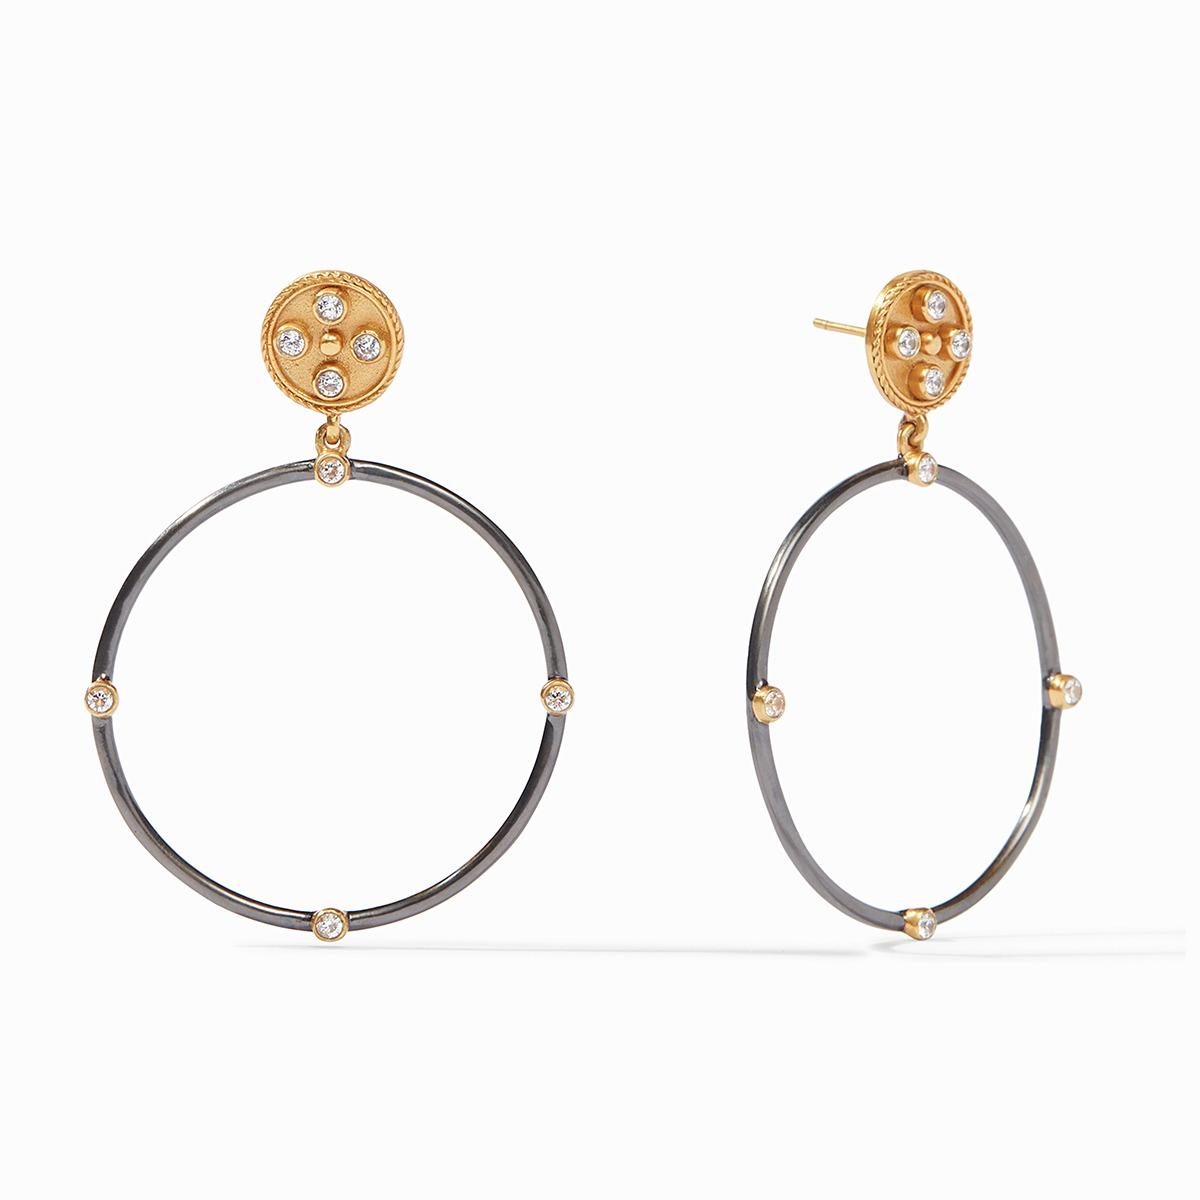 Paris Statement Earrings